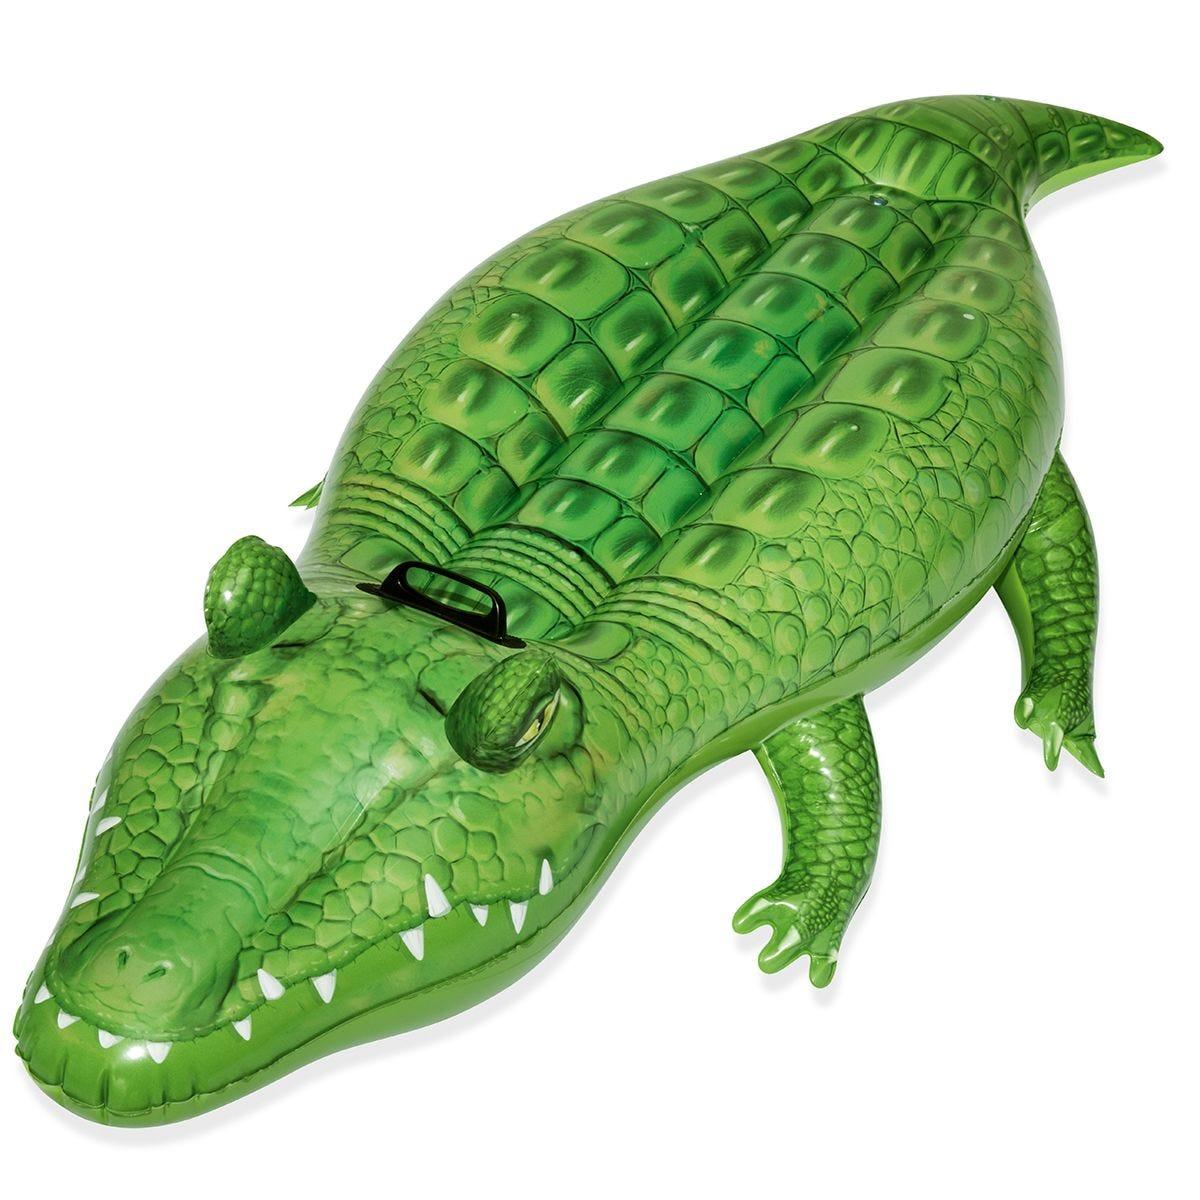 Bestway Crocodile Ride-on